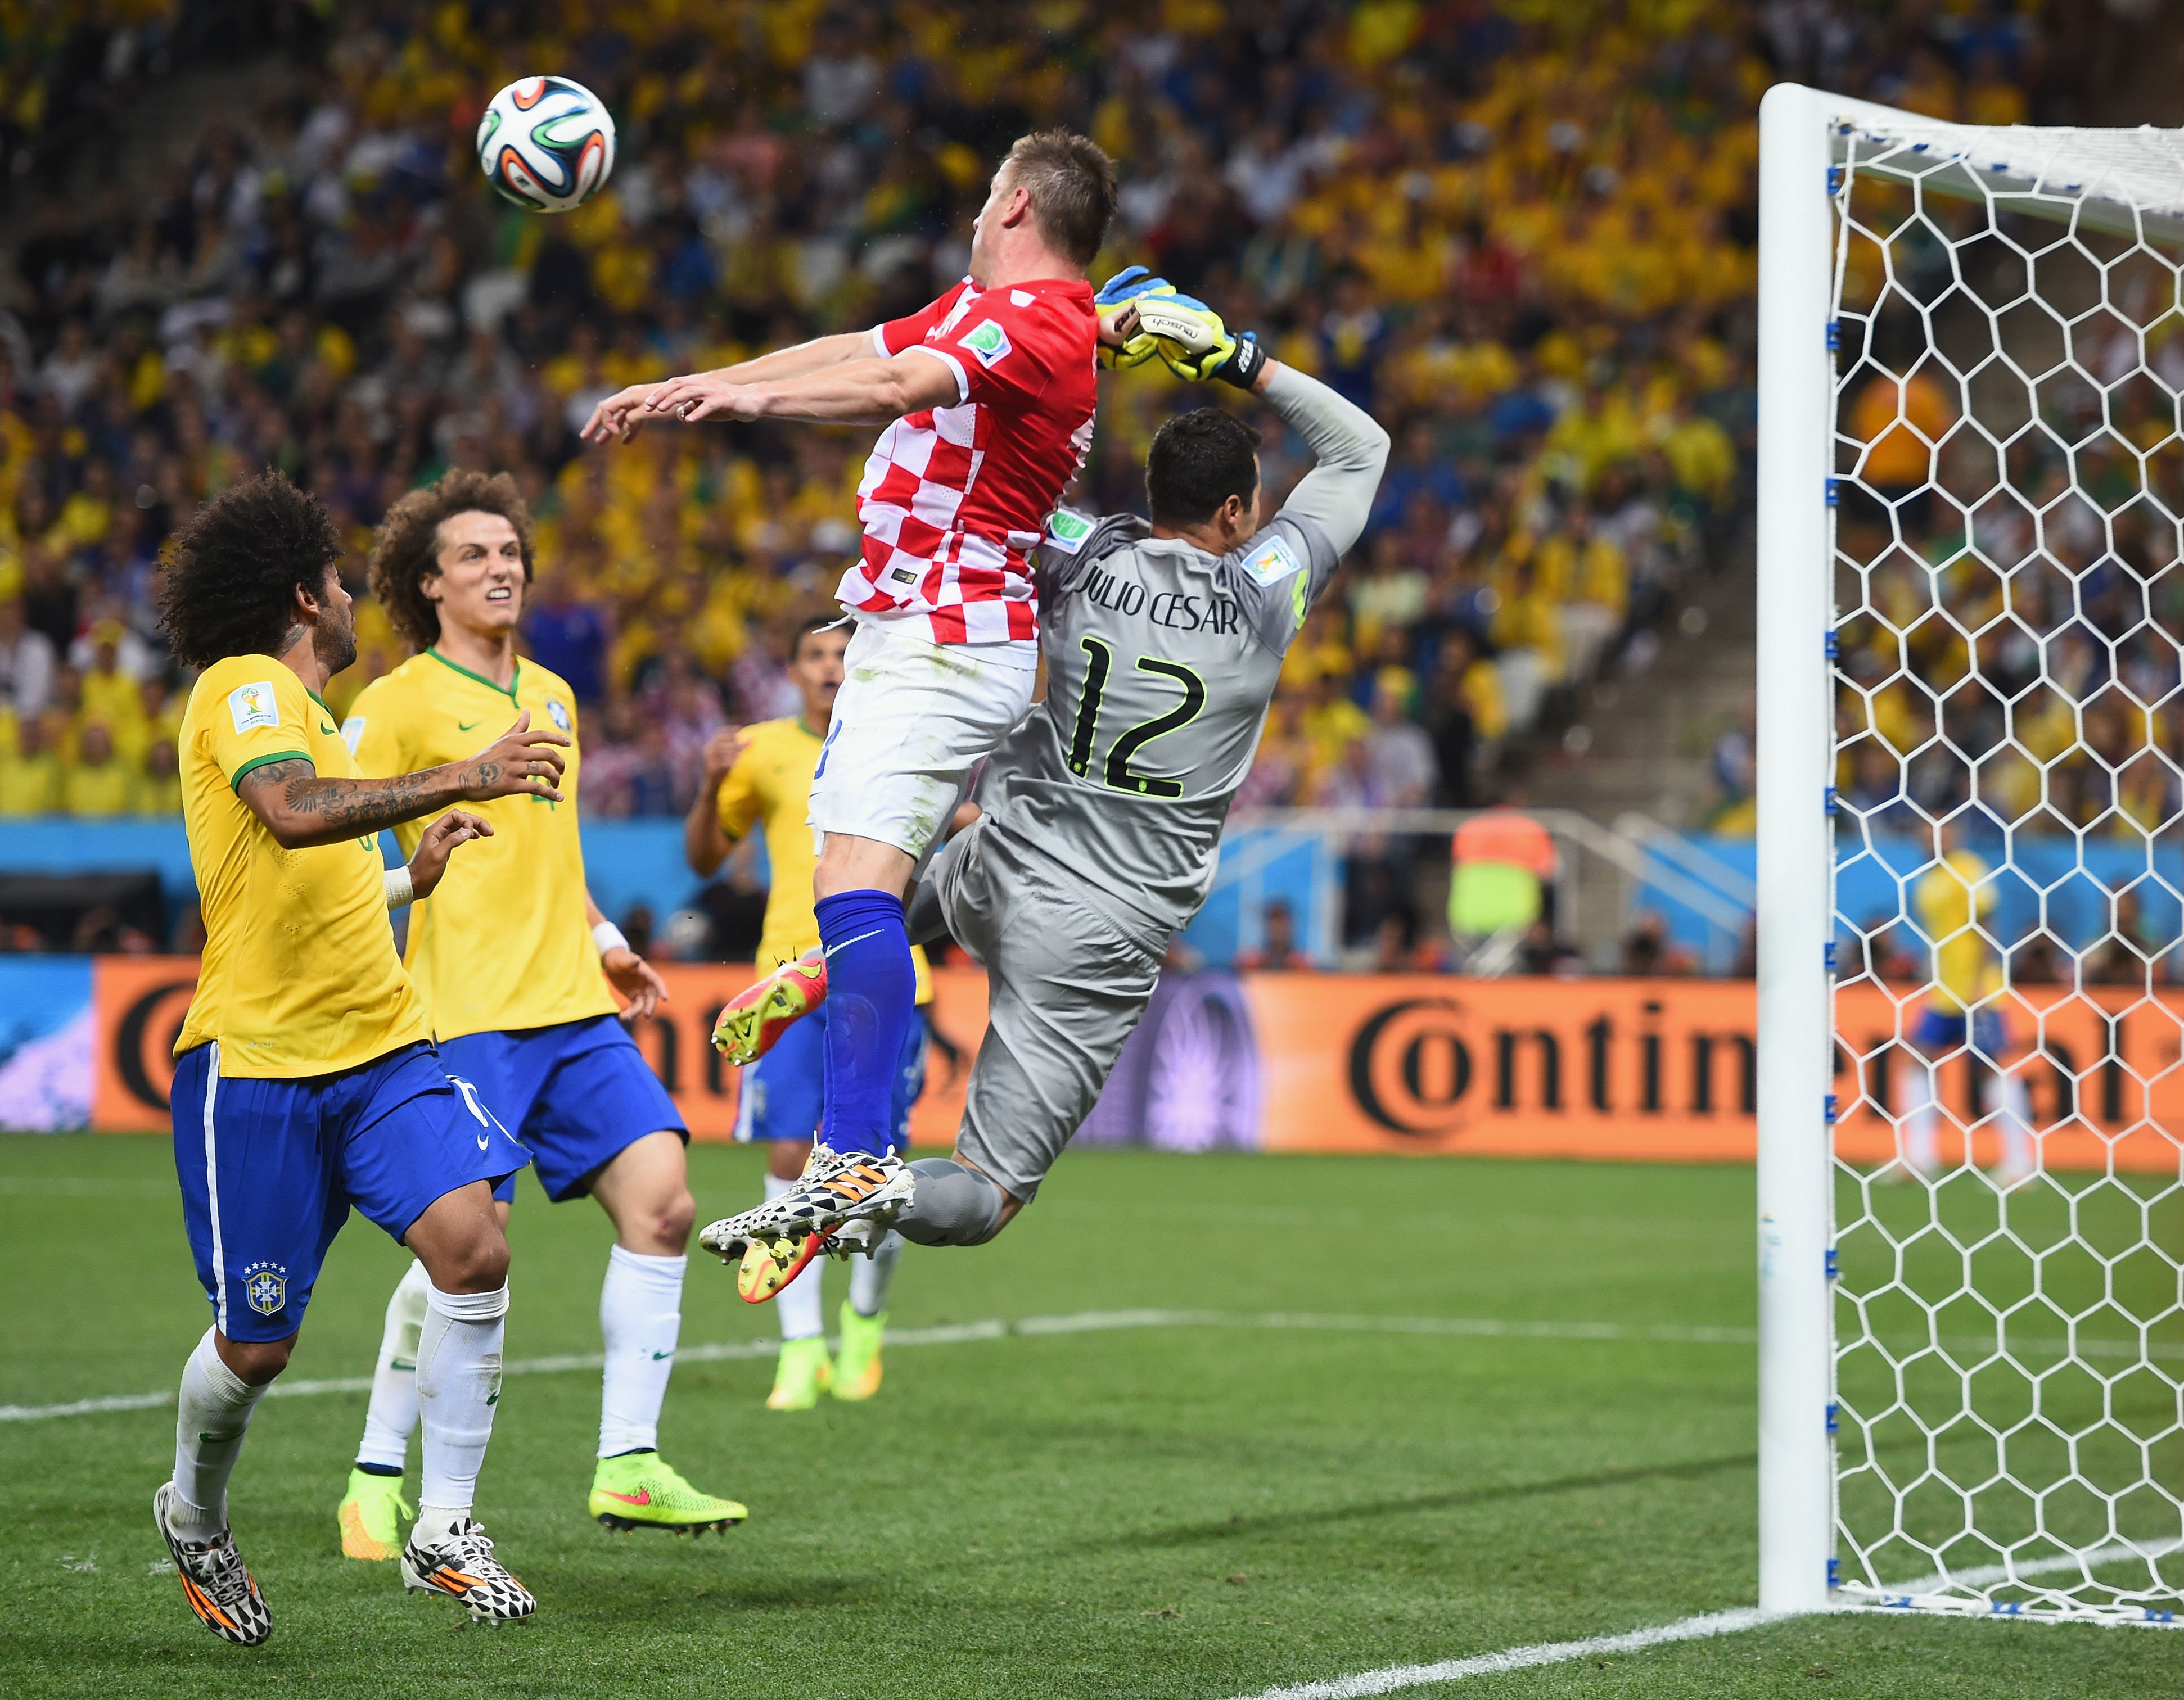 ivica olic - brazil 3 croatia 1 - world cup 2014